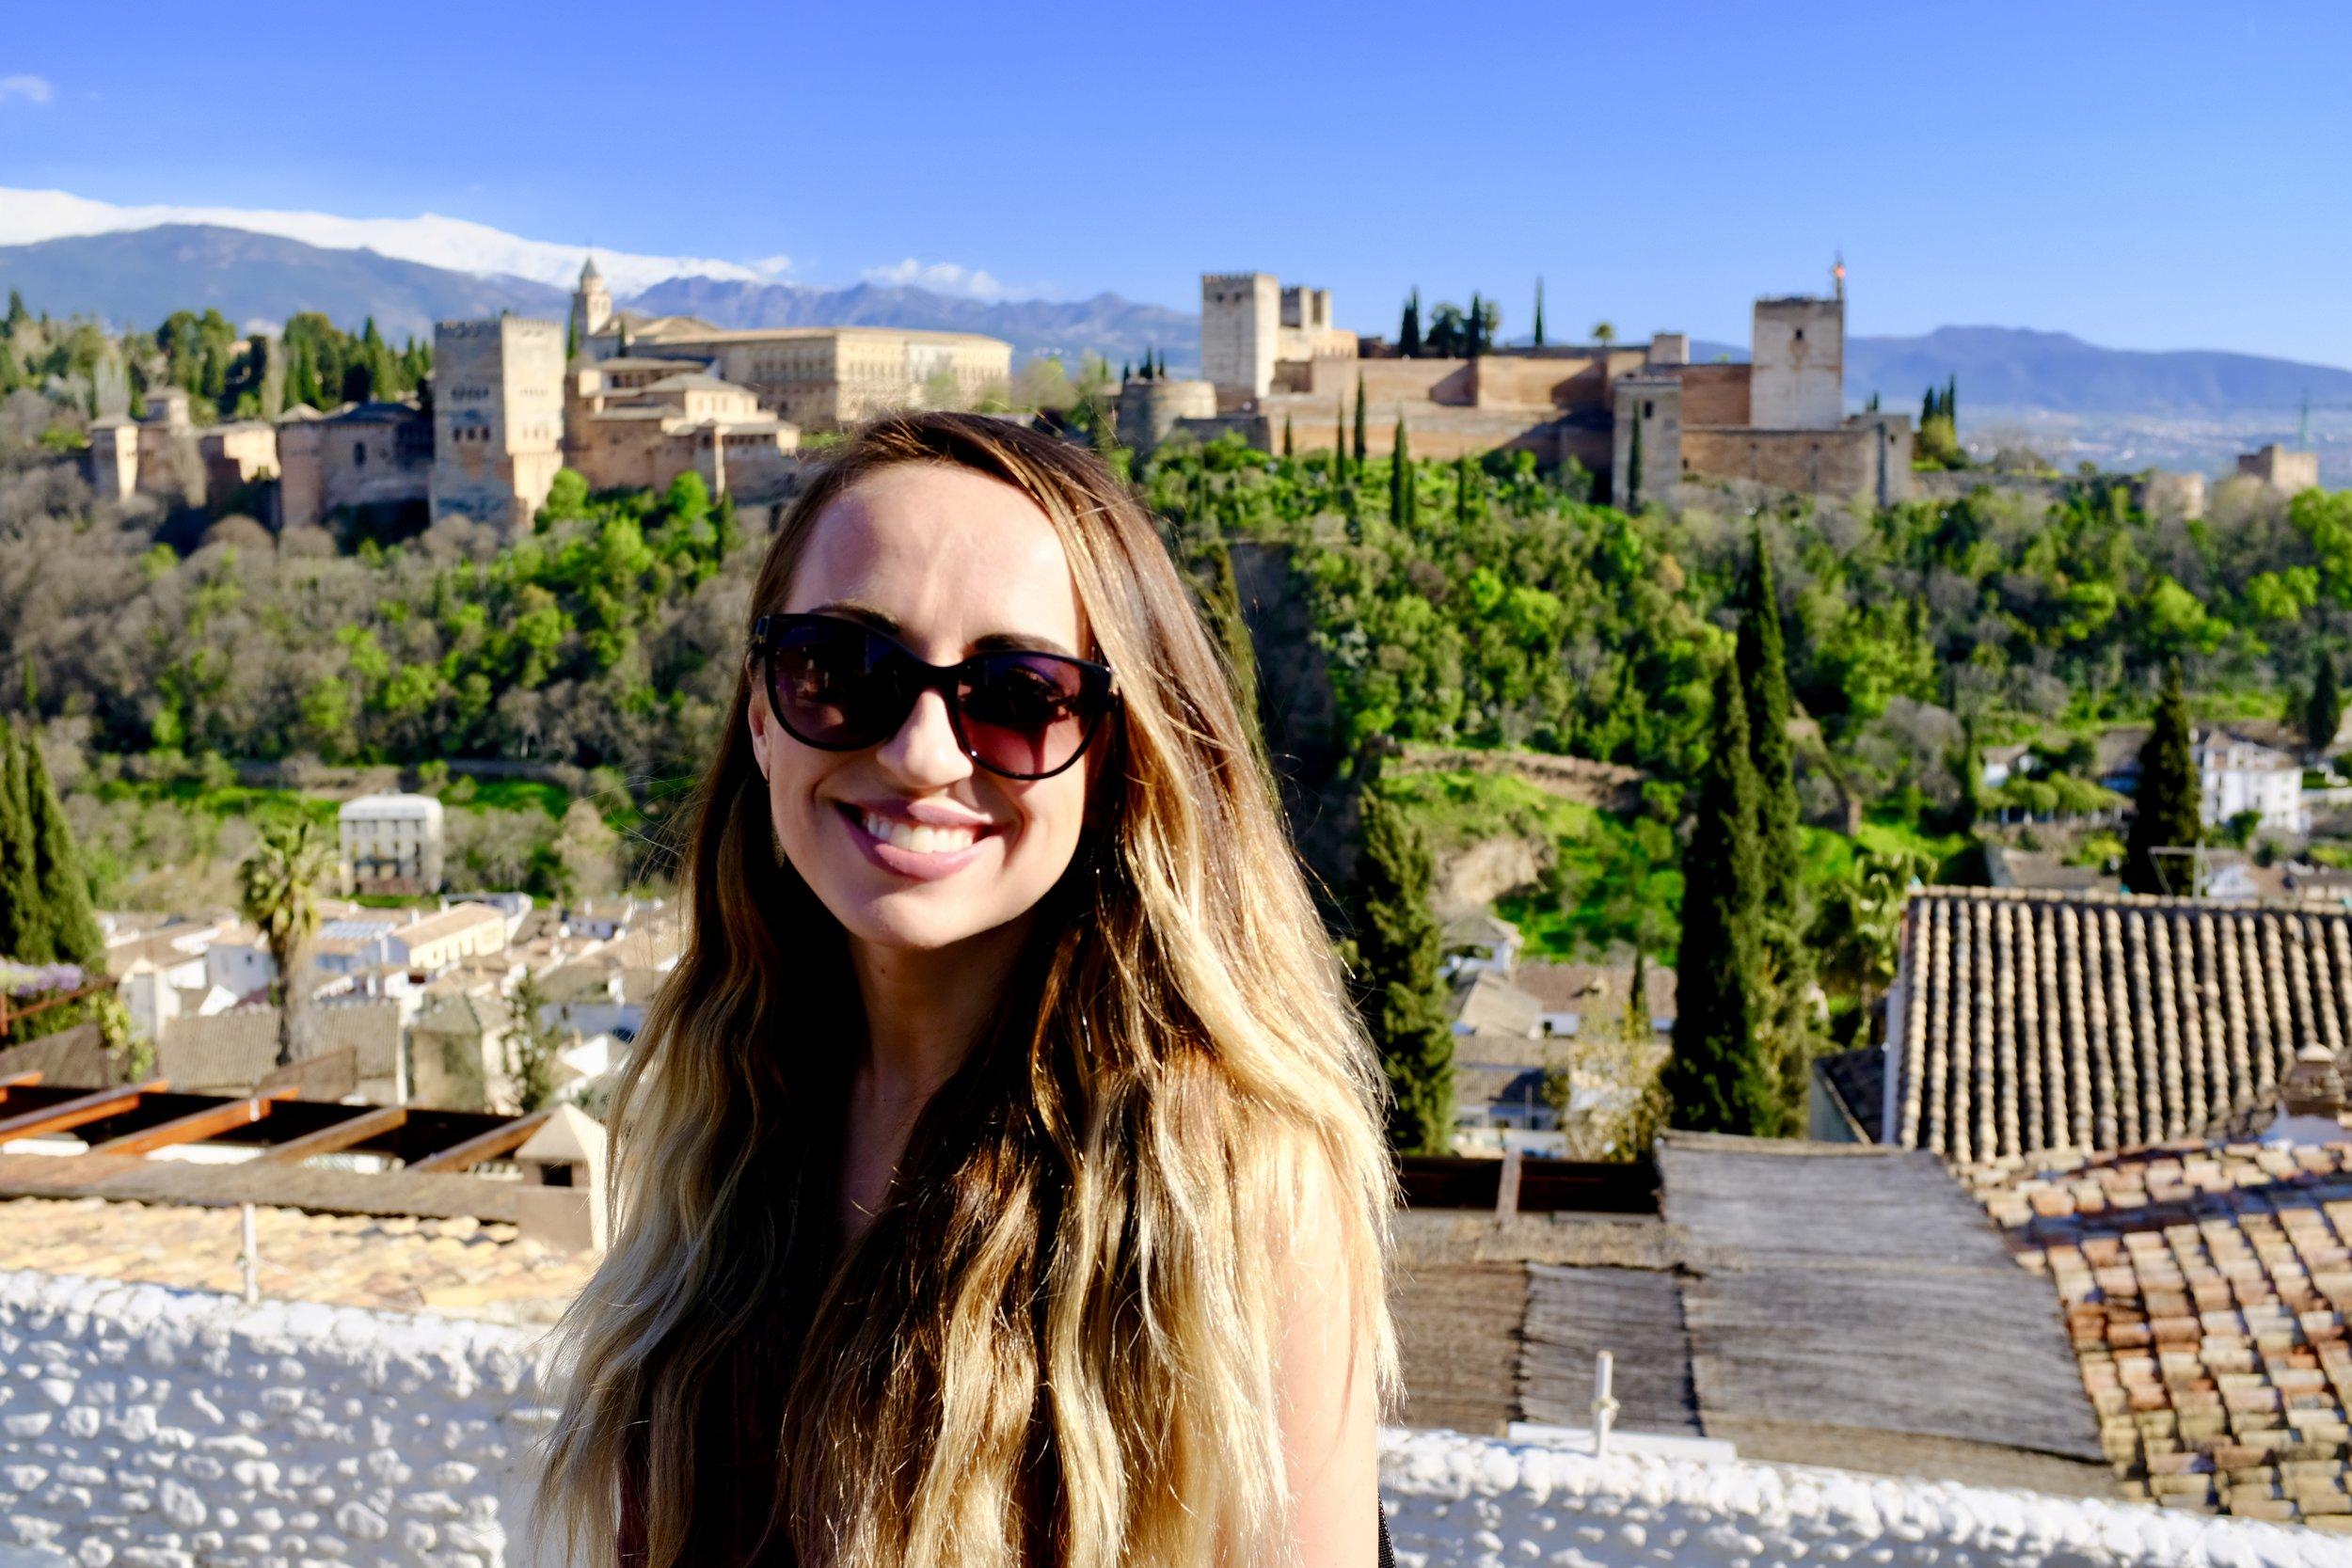 Alhambra_City Nibbler_Granada Spain